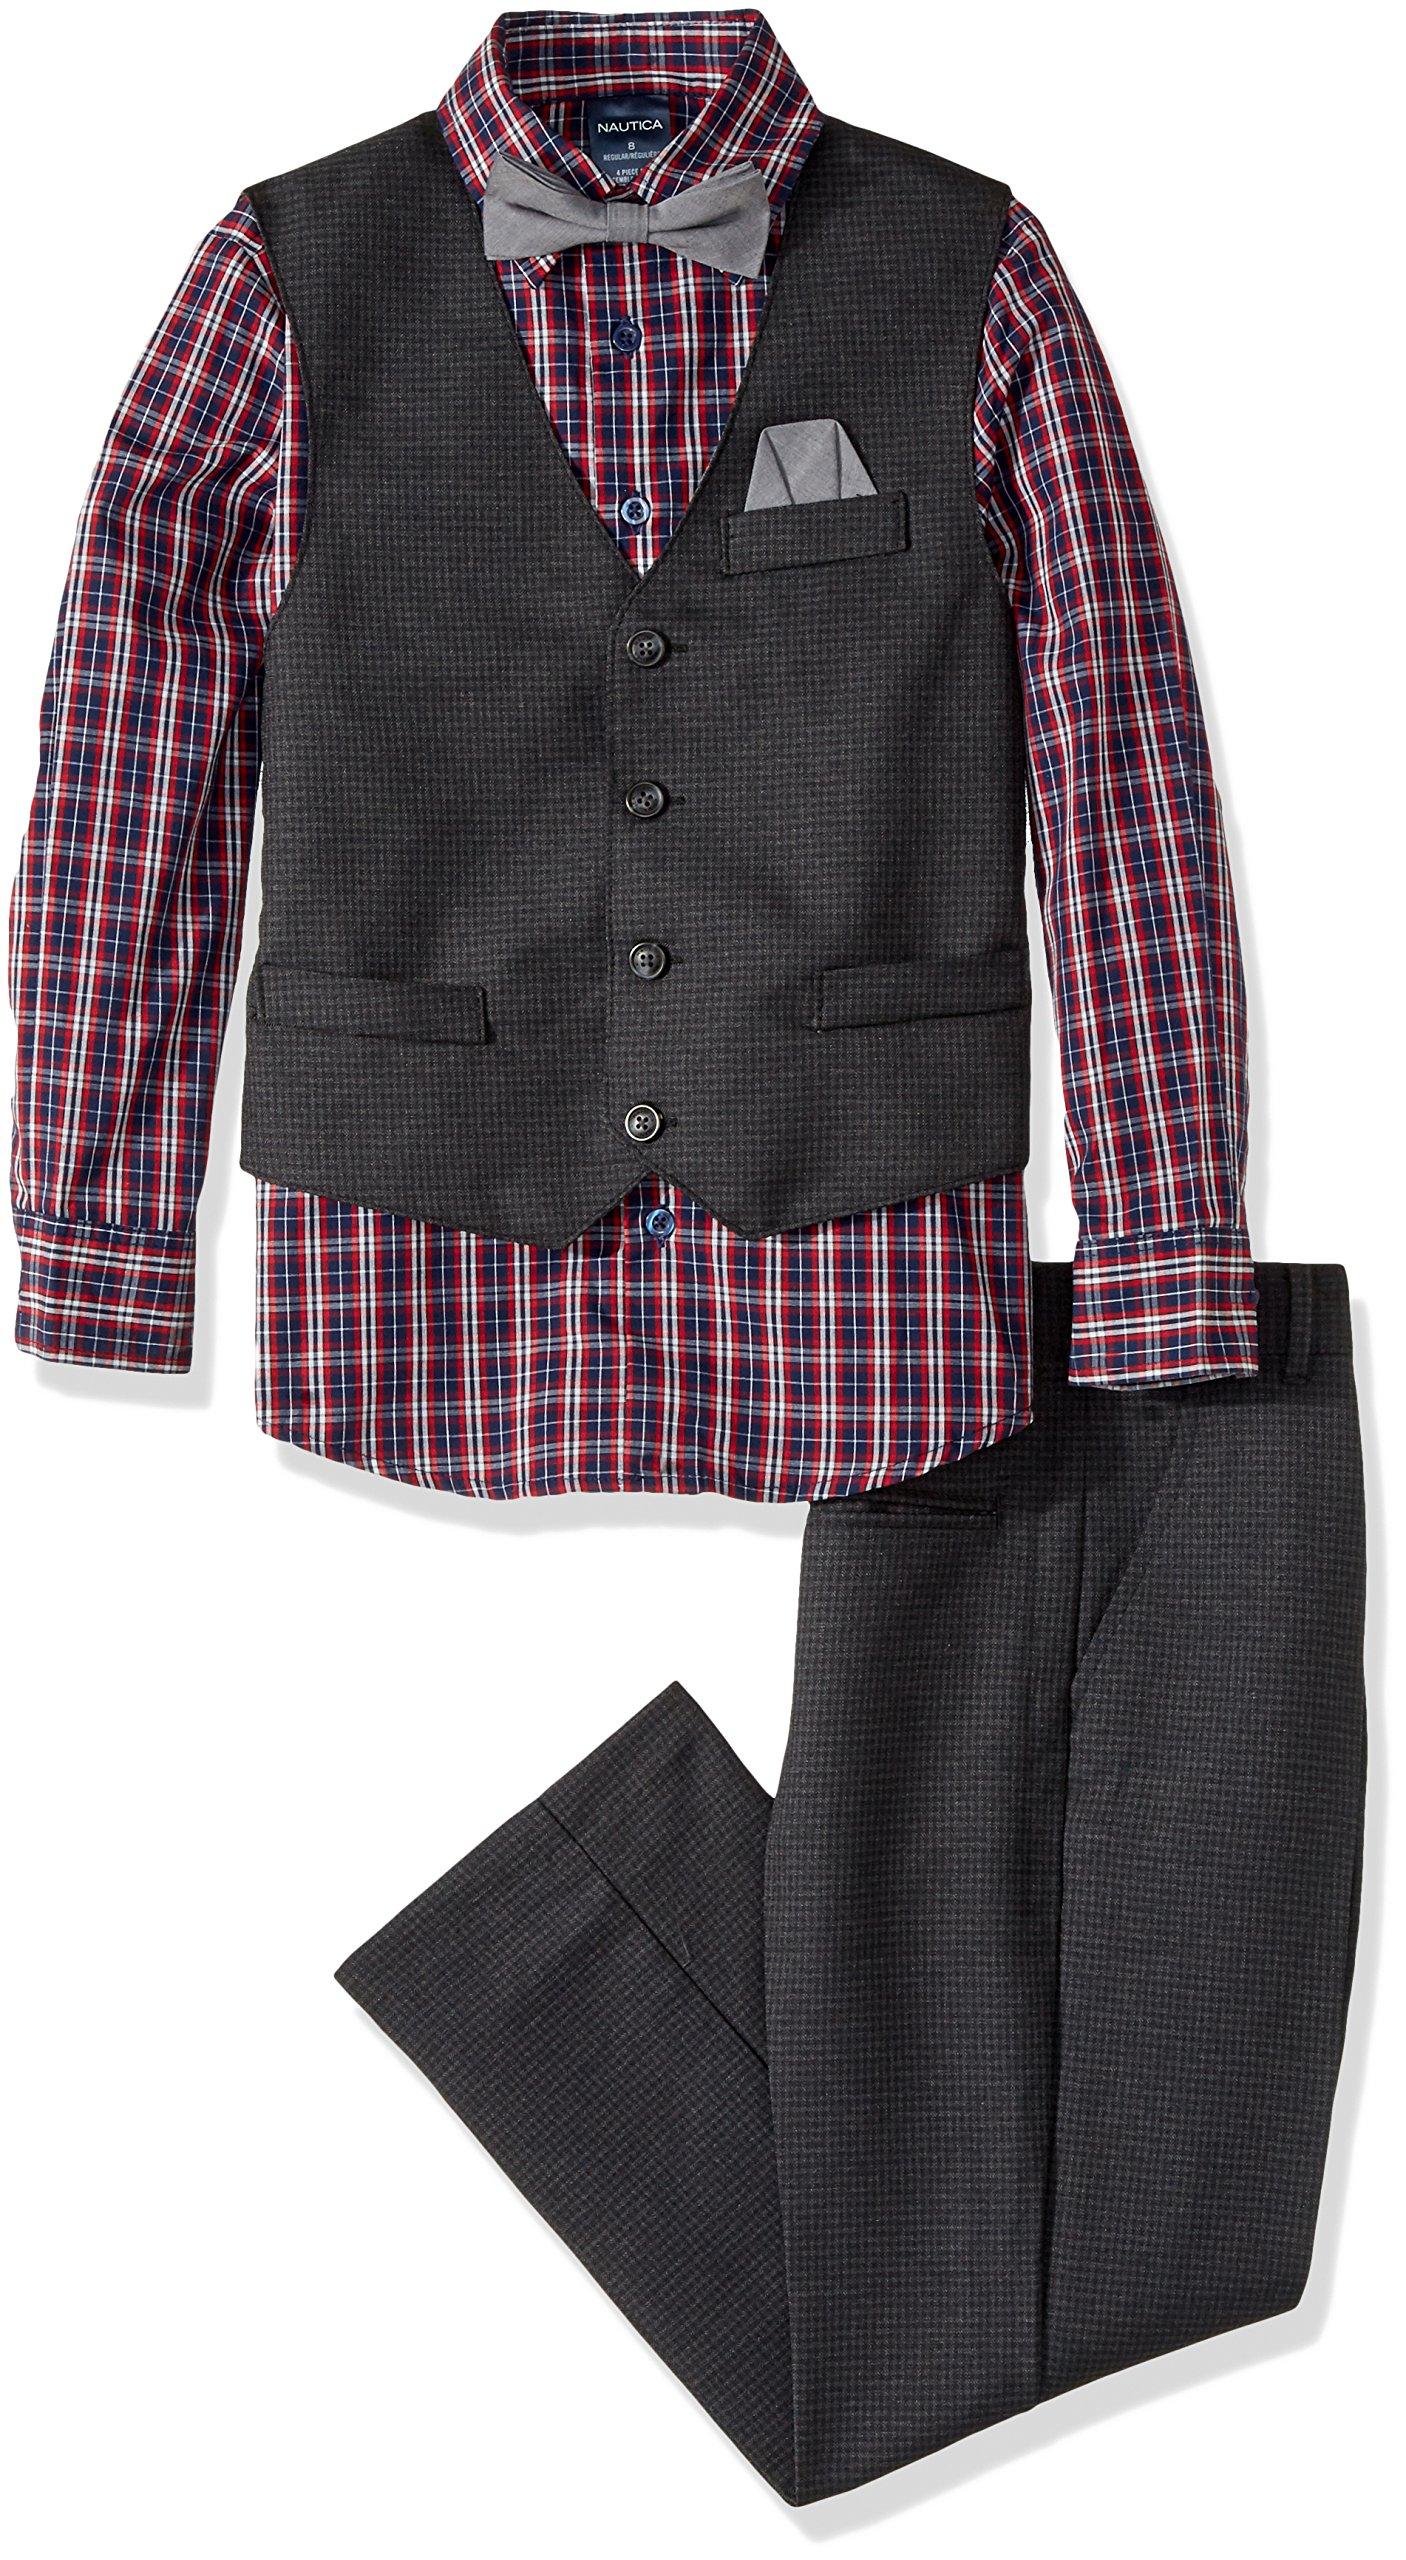 Nautica Big Boys' Set with Vest, Pant, Shirt, and Bow Tie, Black/Grey, 18